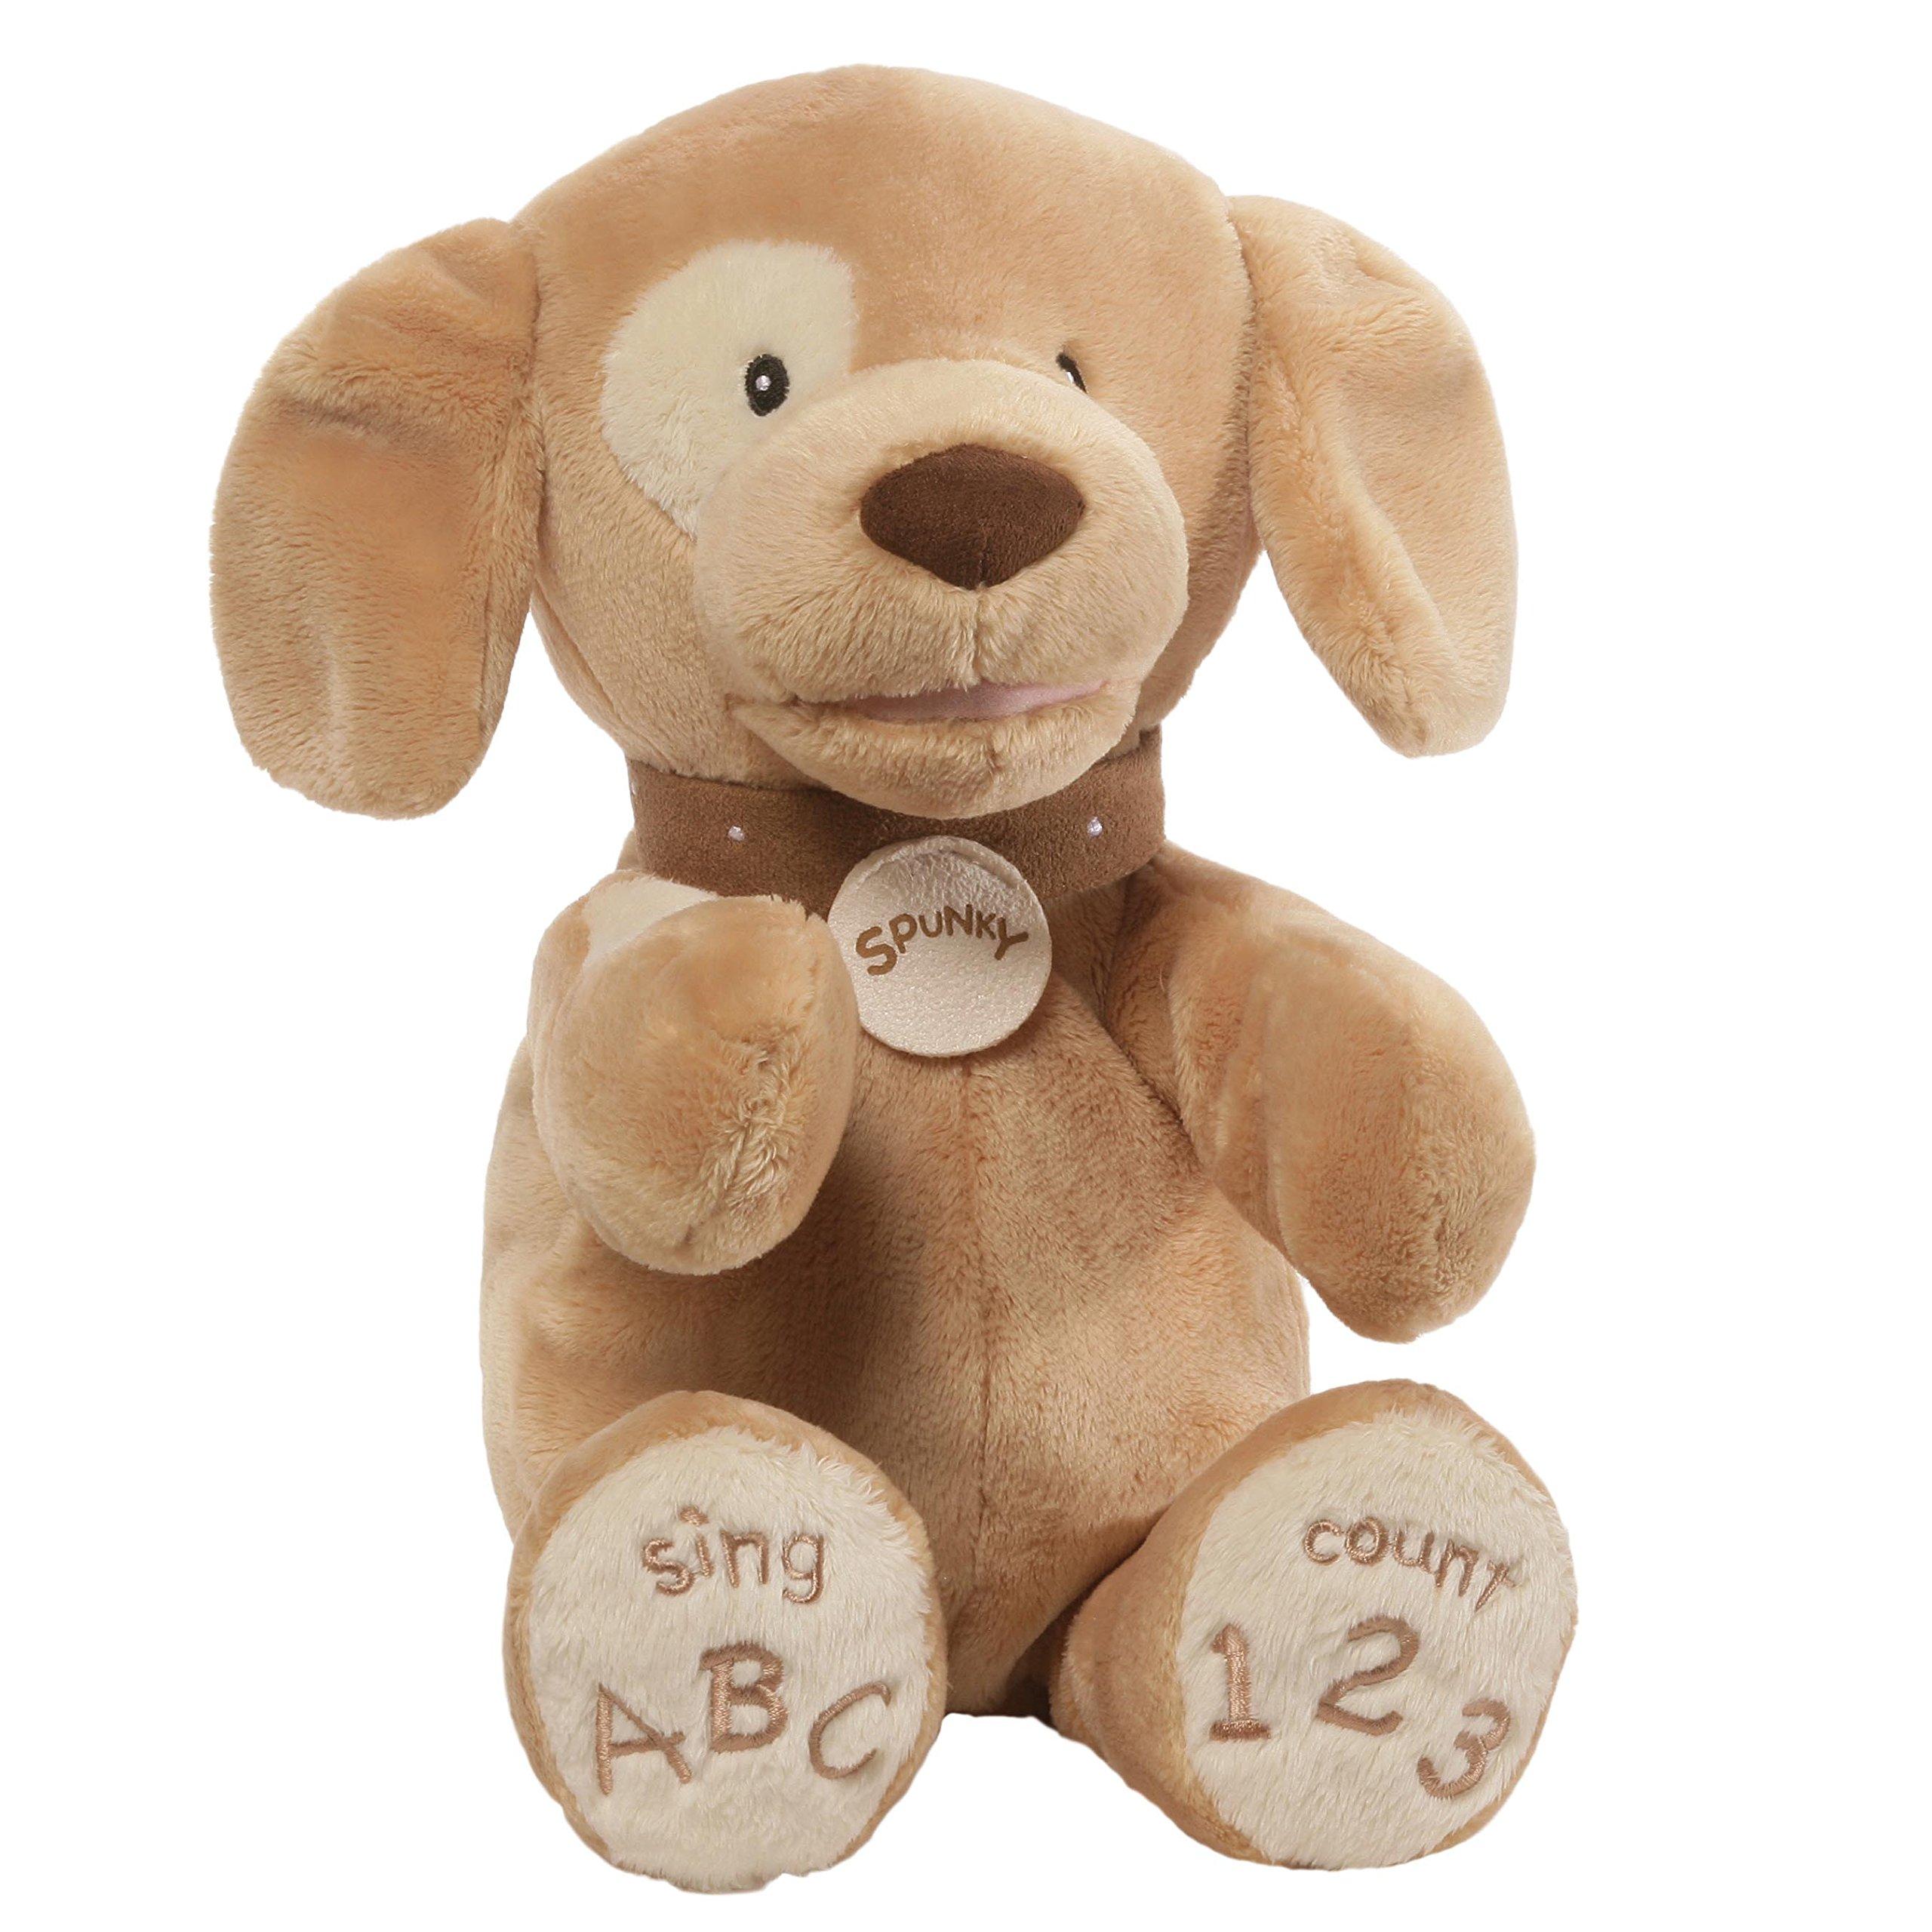 GUND Baby Spunky Doggie ABC 123 Animated Stuffed Animal Plush, Tan, 14'' by GUND